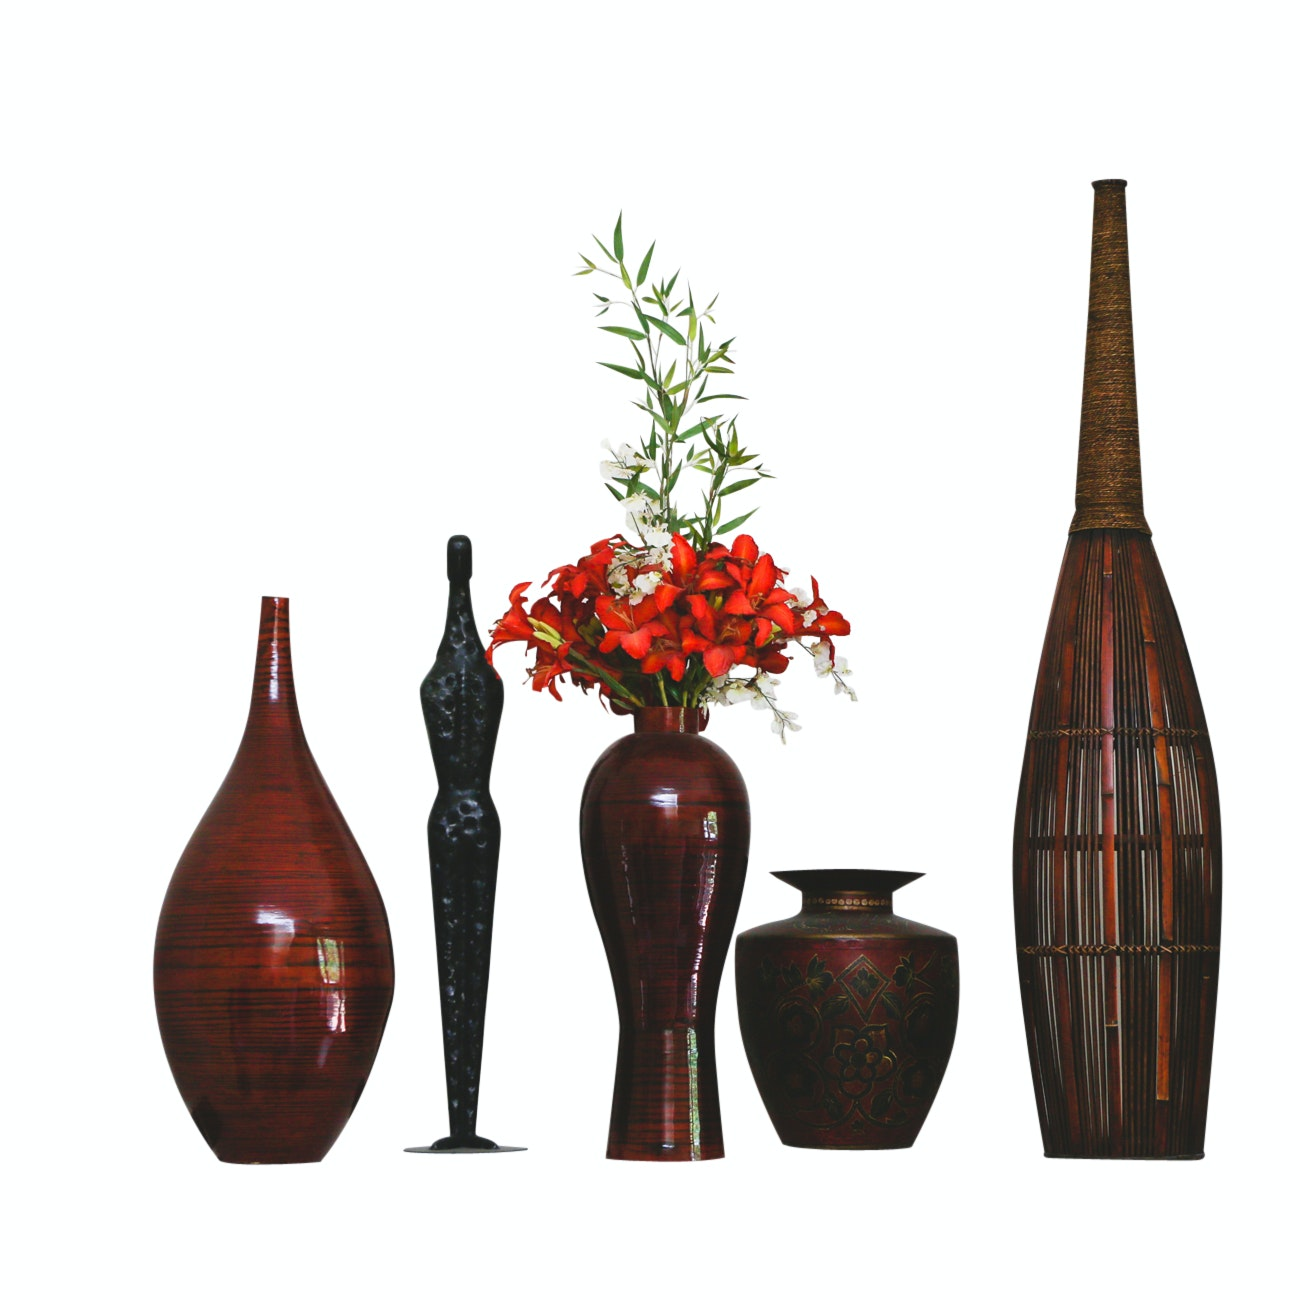 Ceramic and Metal Vases with Hammered Metal Figurine